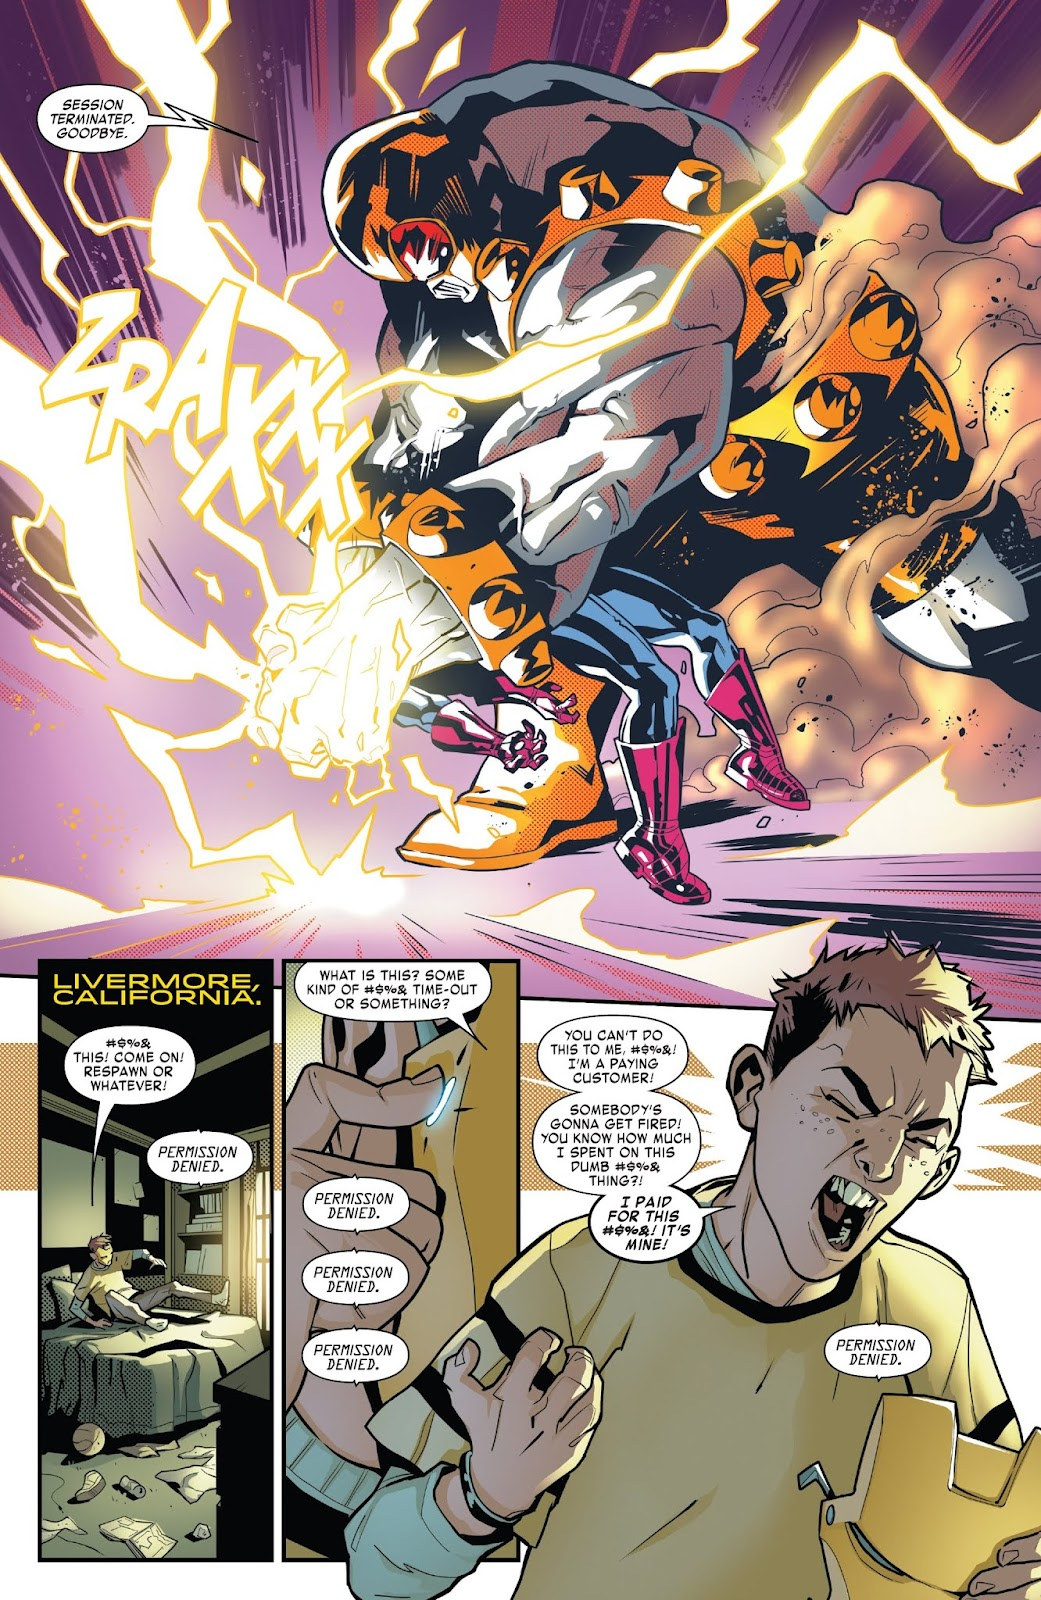 Read online Tony Stark: Iron Man comic -  Issue #6 - 10